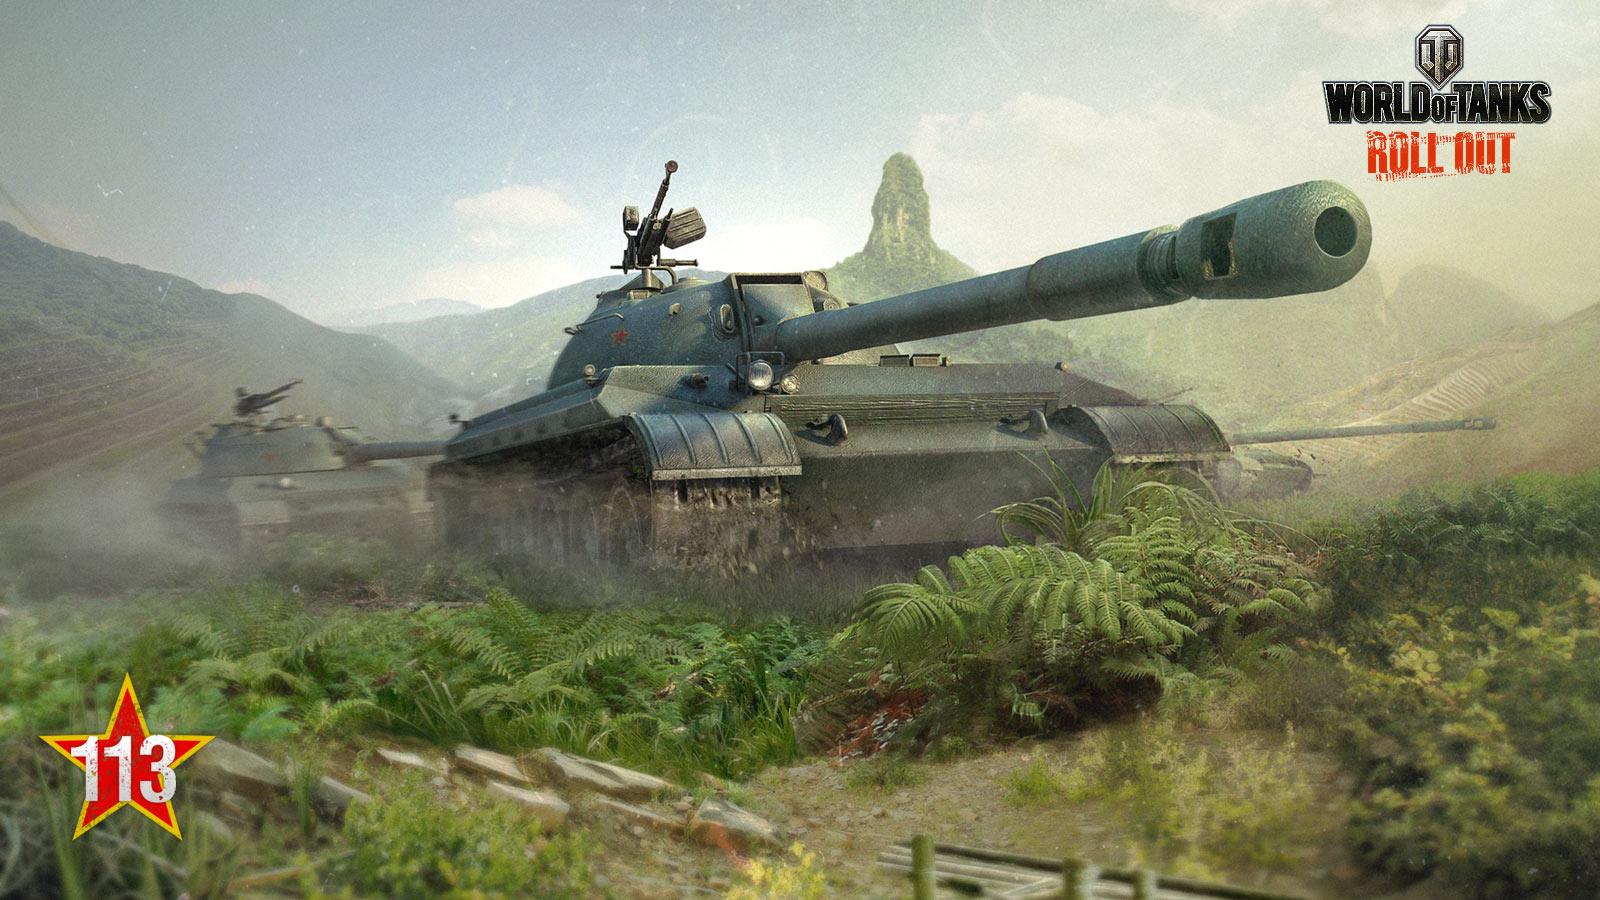 image - wot wallpaper (6) | world of tanks wiki | fandom powered